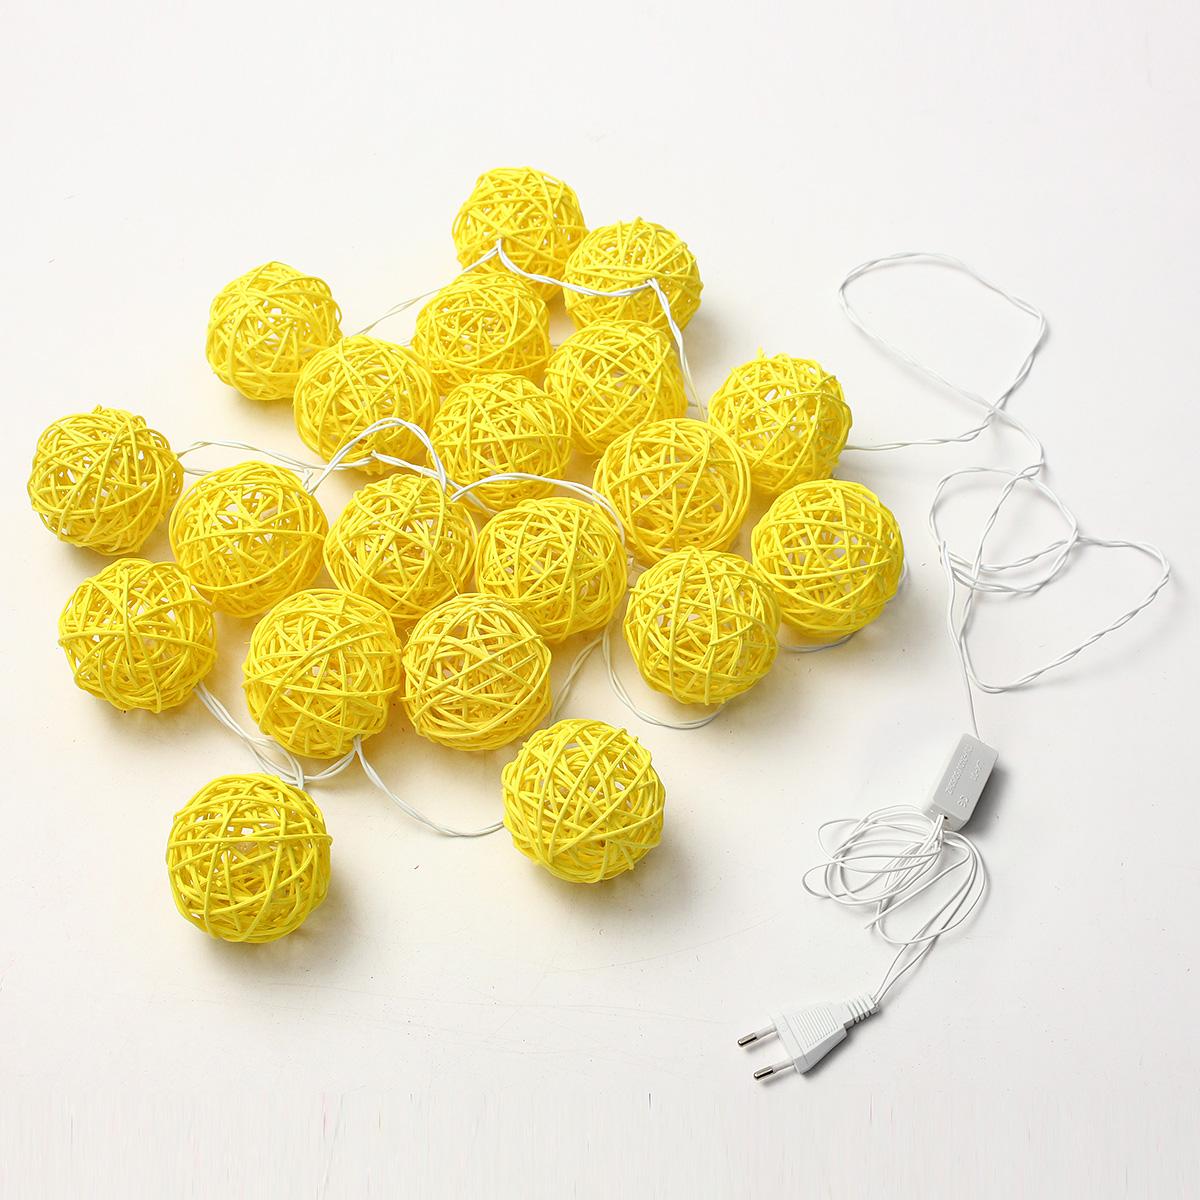 20 LED Rattan Ball String Light Home Garden Fairy Colorful Lamp Wedding Party Xmas Decor